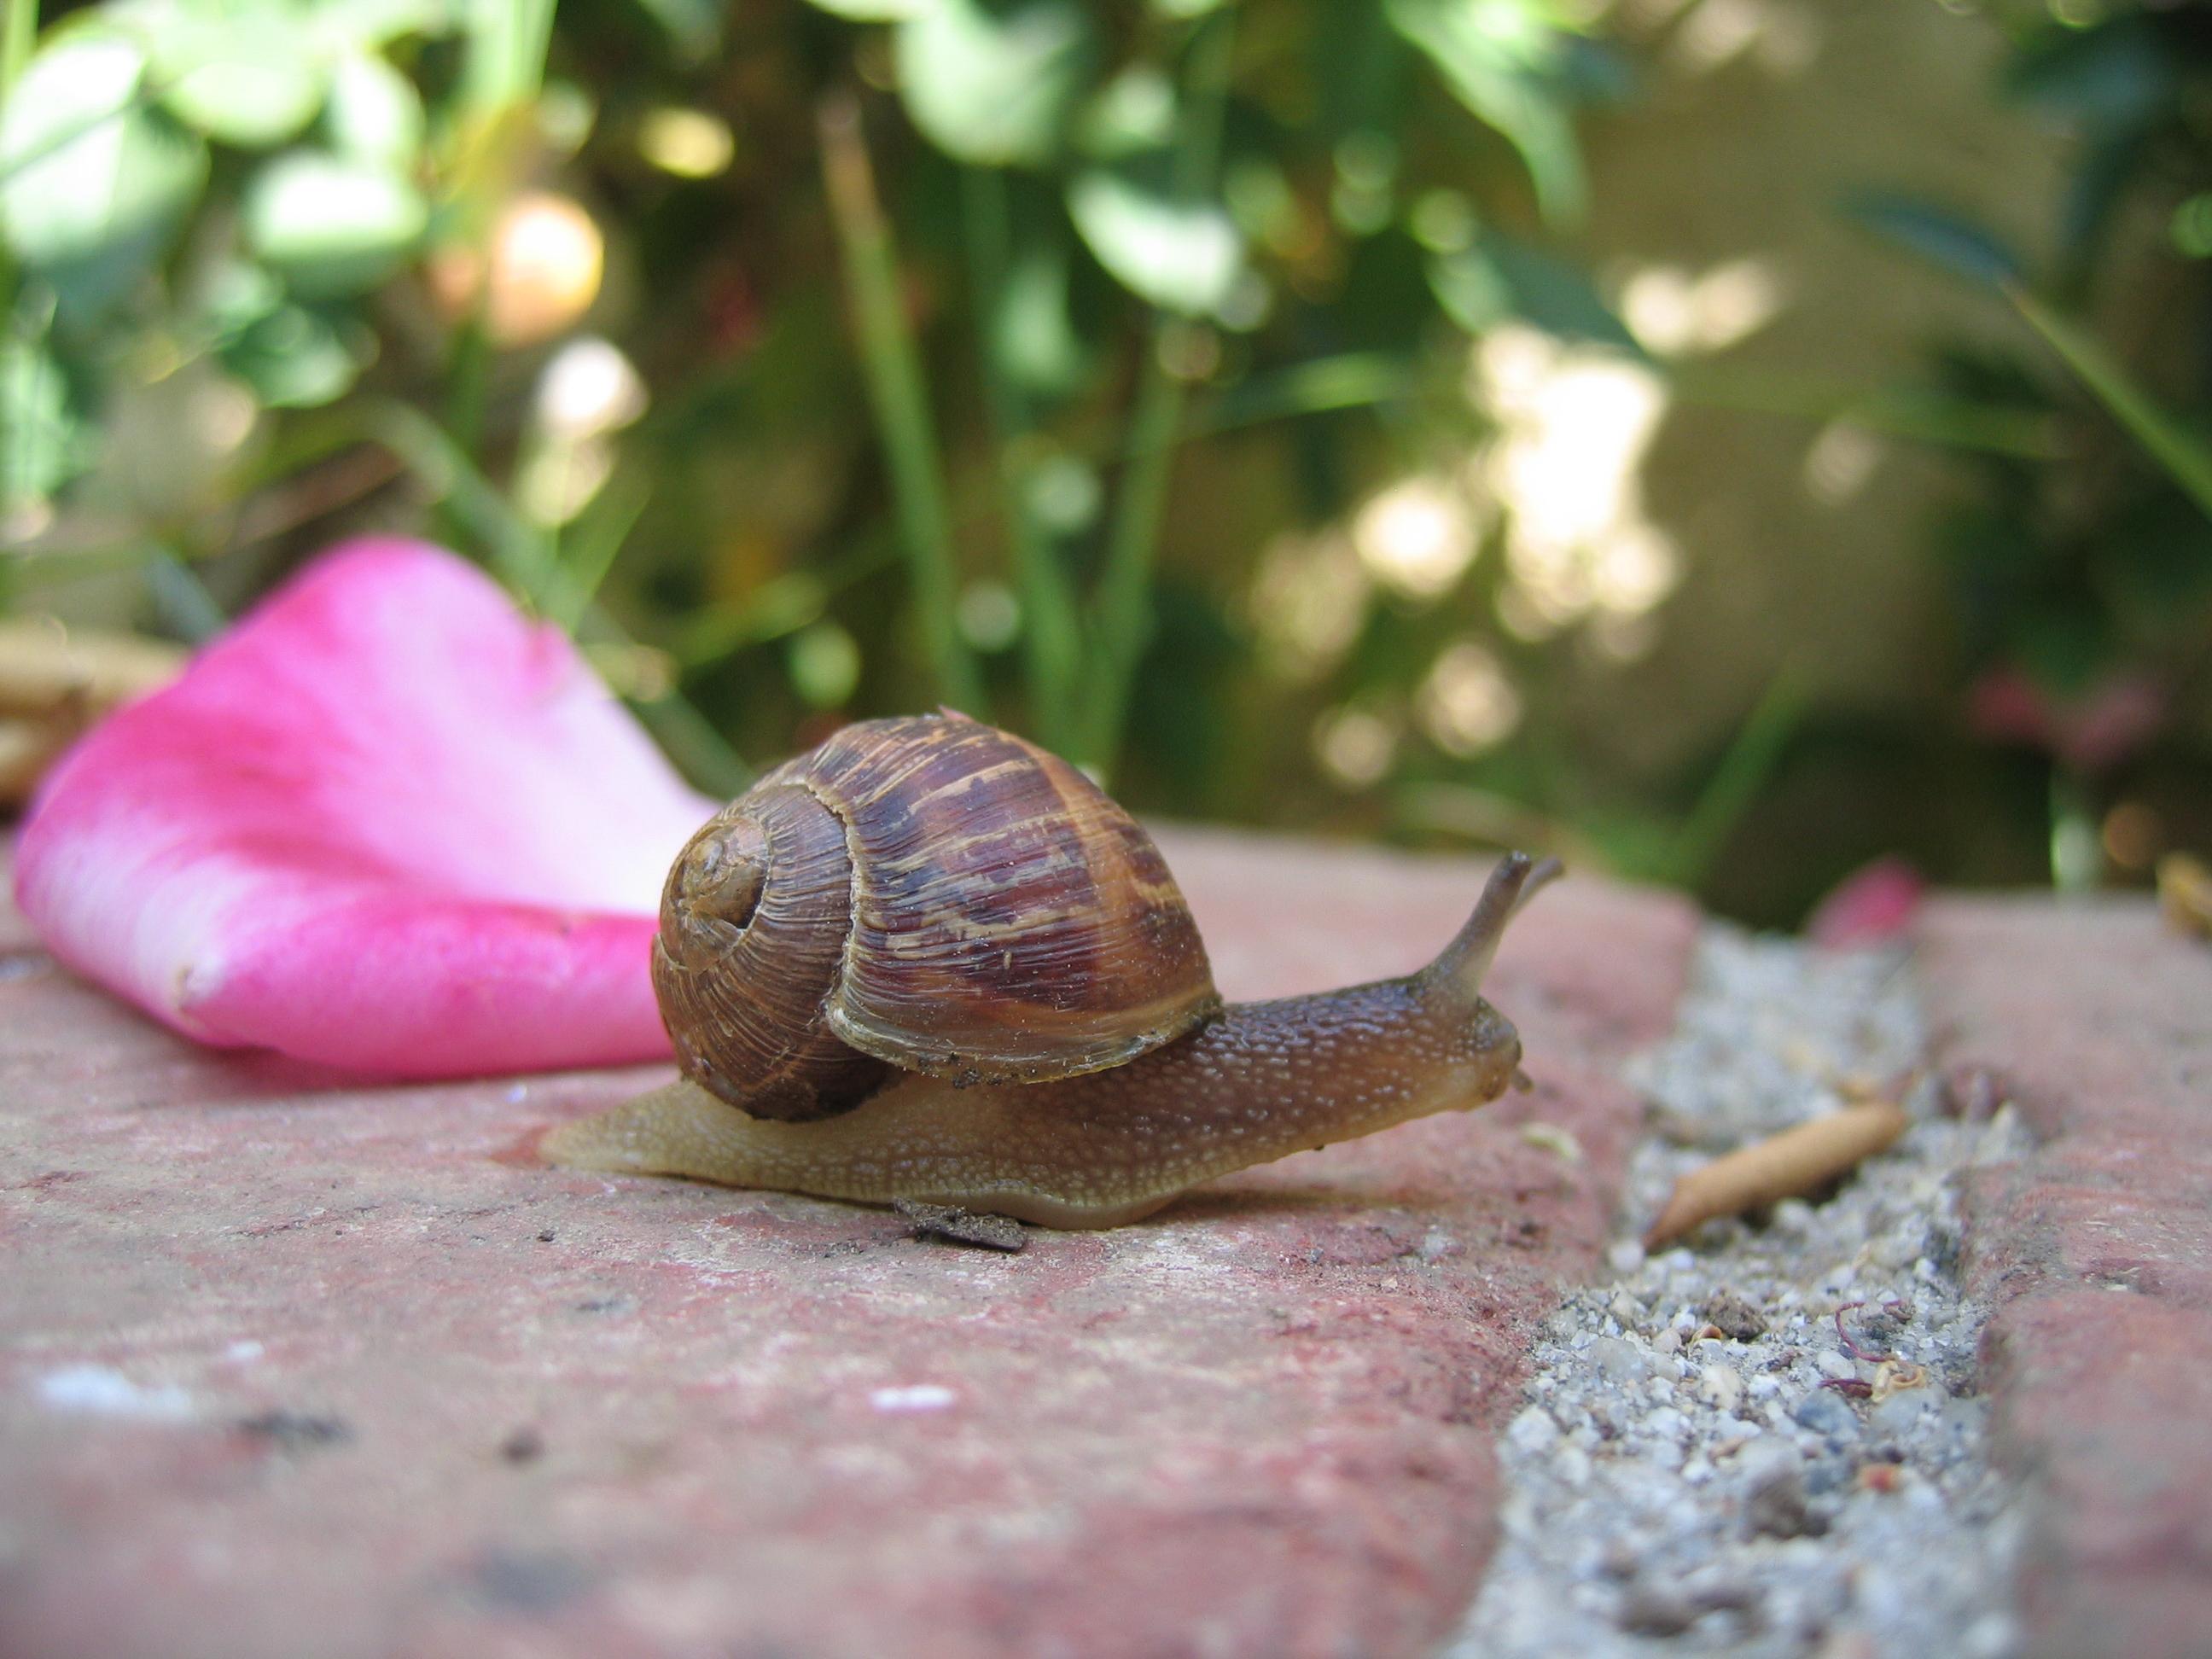 Snaily the Sea Snail